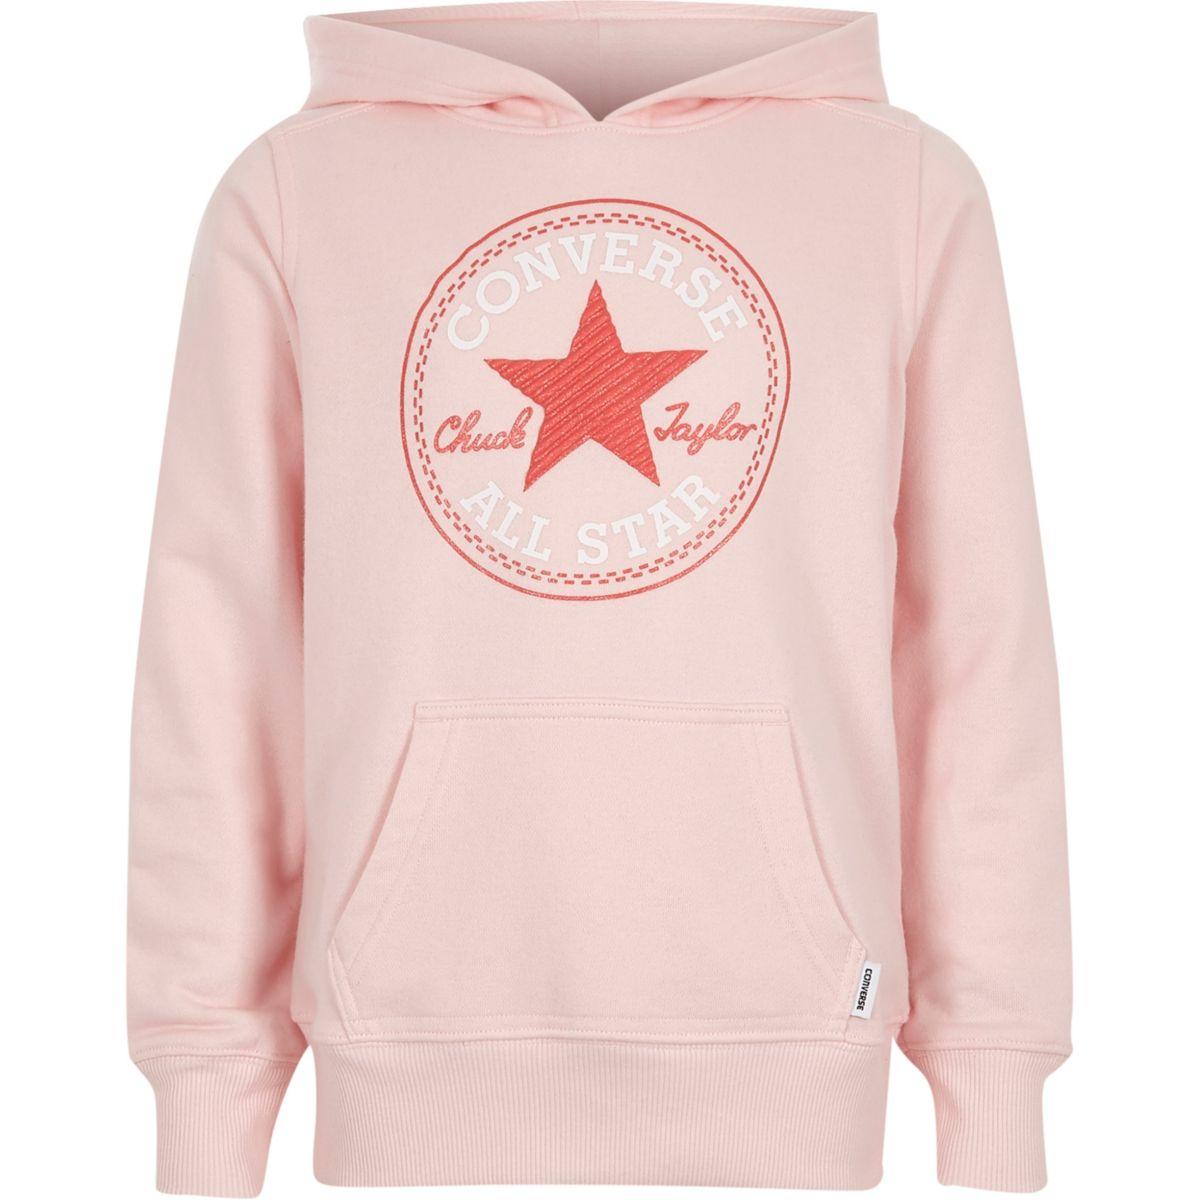 Converse – Sweat à capuche à imprimé étoile rose fille